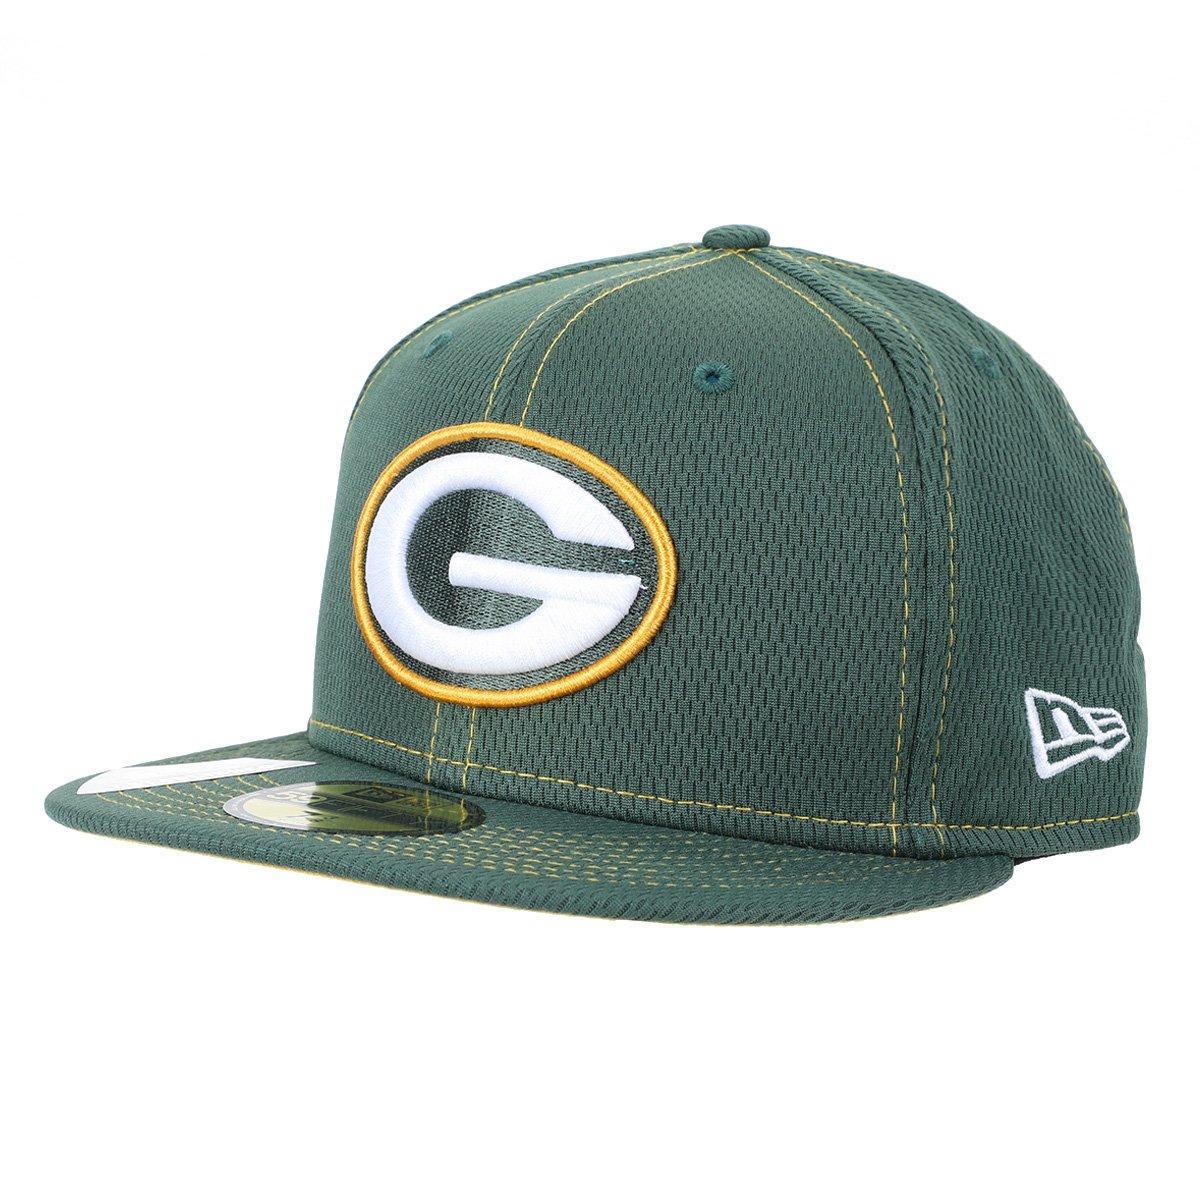 Boné NFL Green Bay Packers New Era Aba Reta Rd 5950